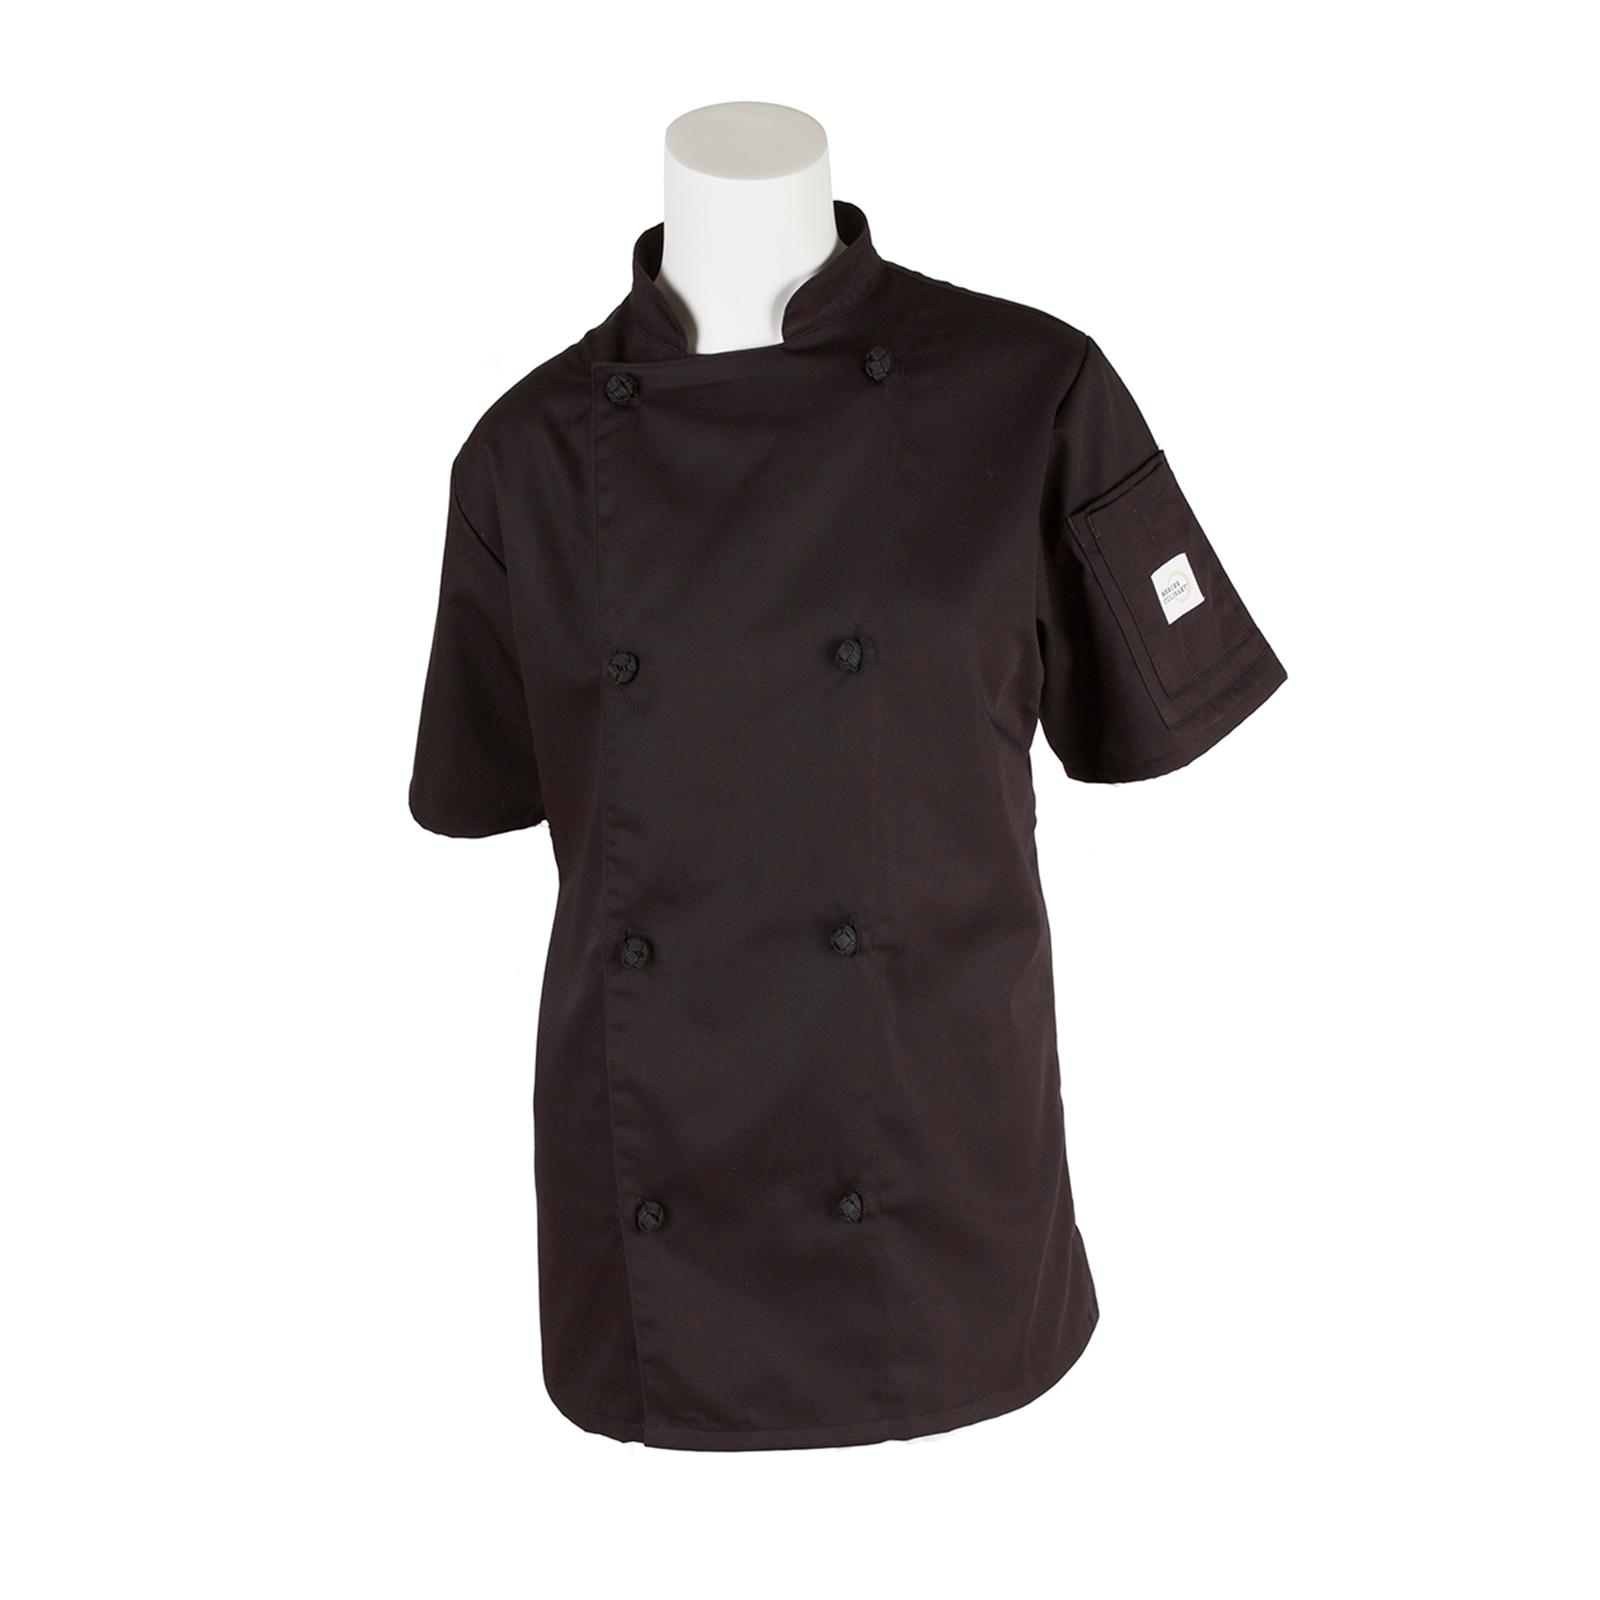 Mercer Culinary M61042BK2X chef's coat